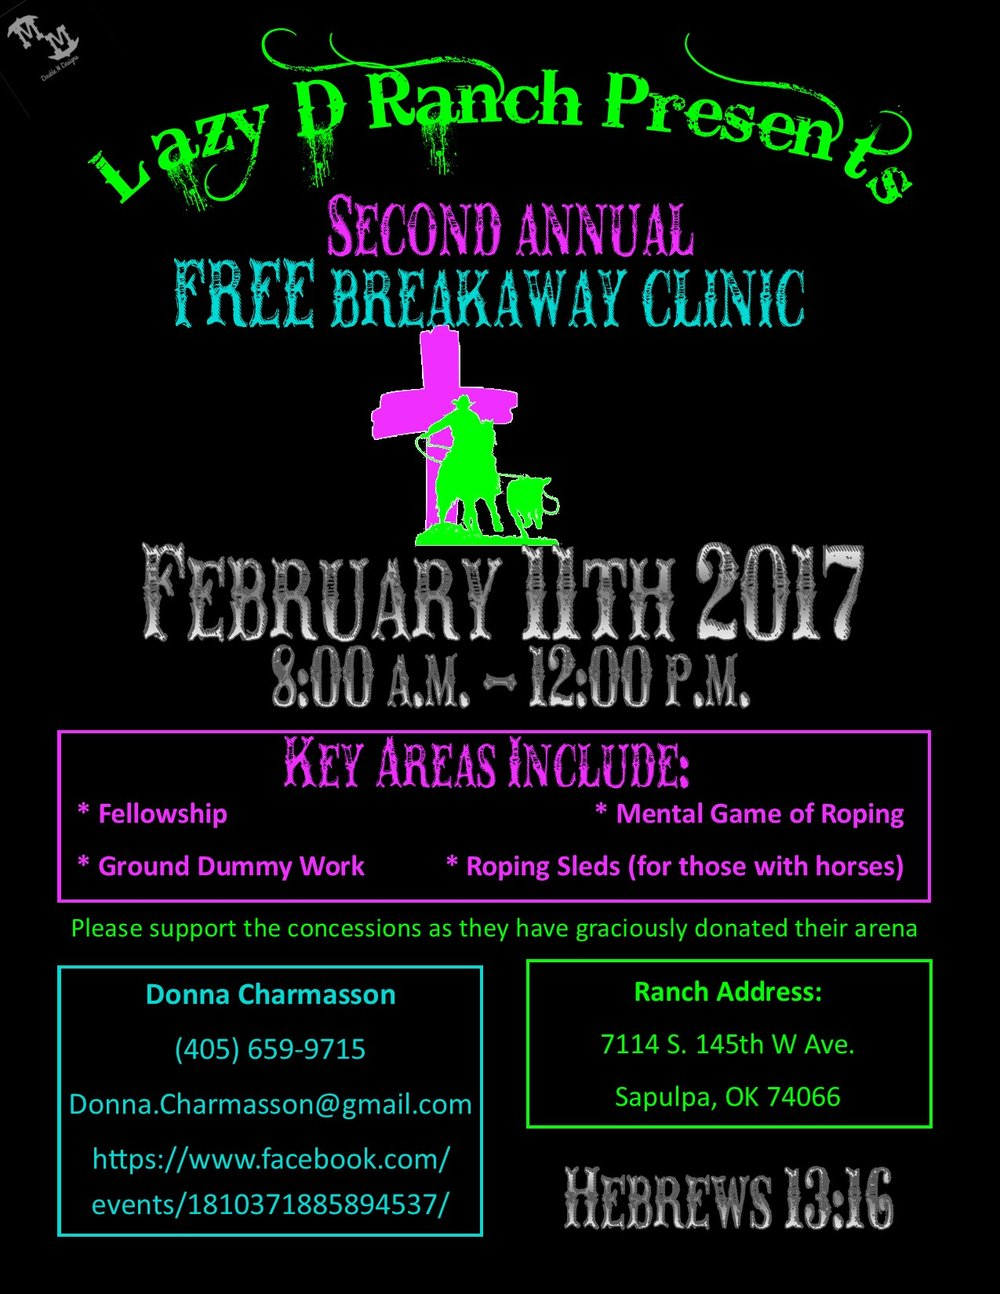 free breakaway clinic 2nd annual.jpg